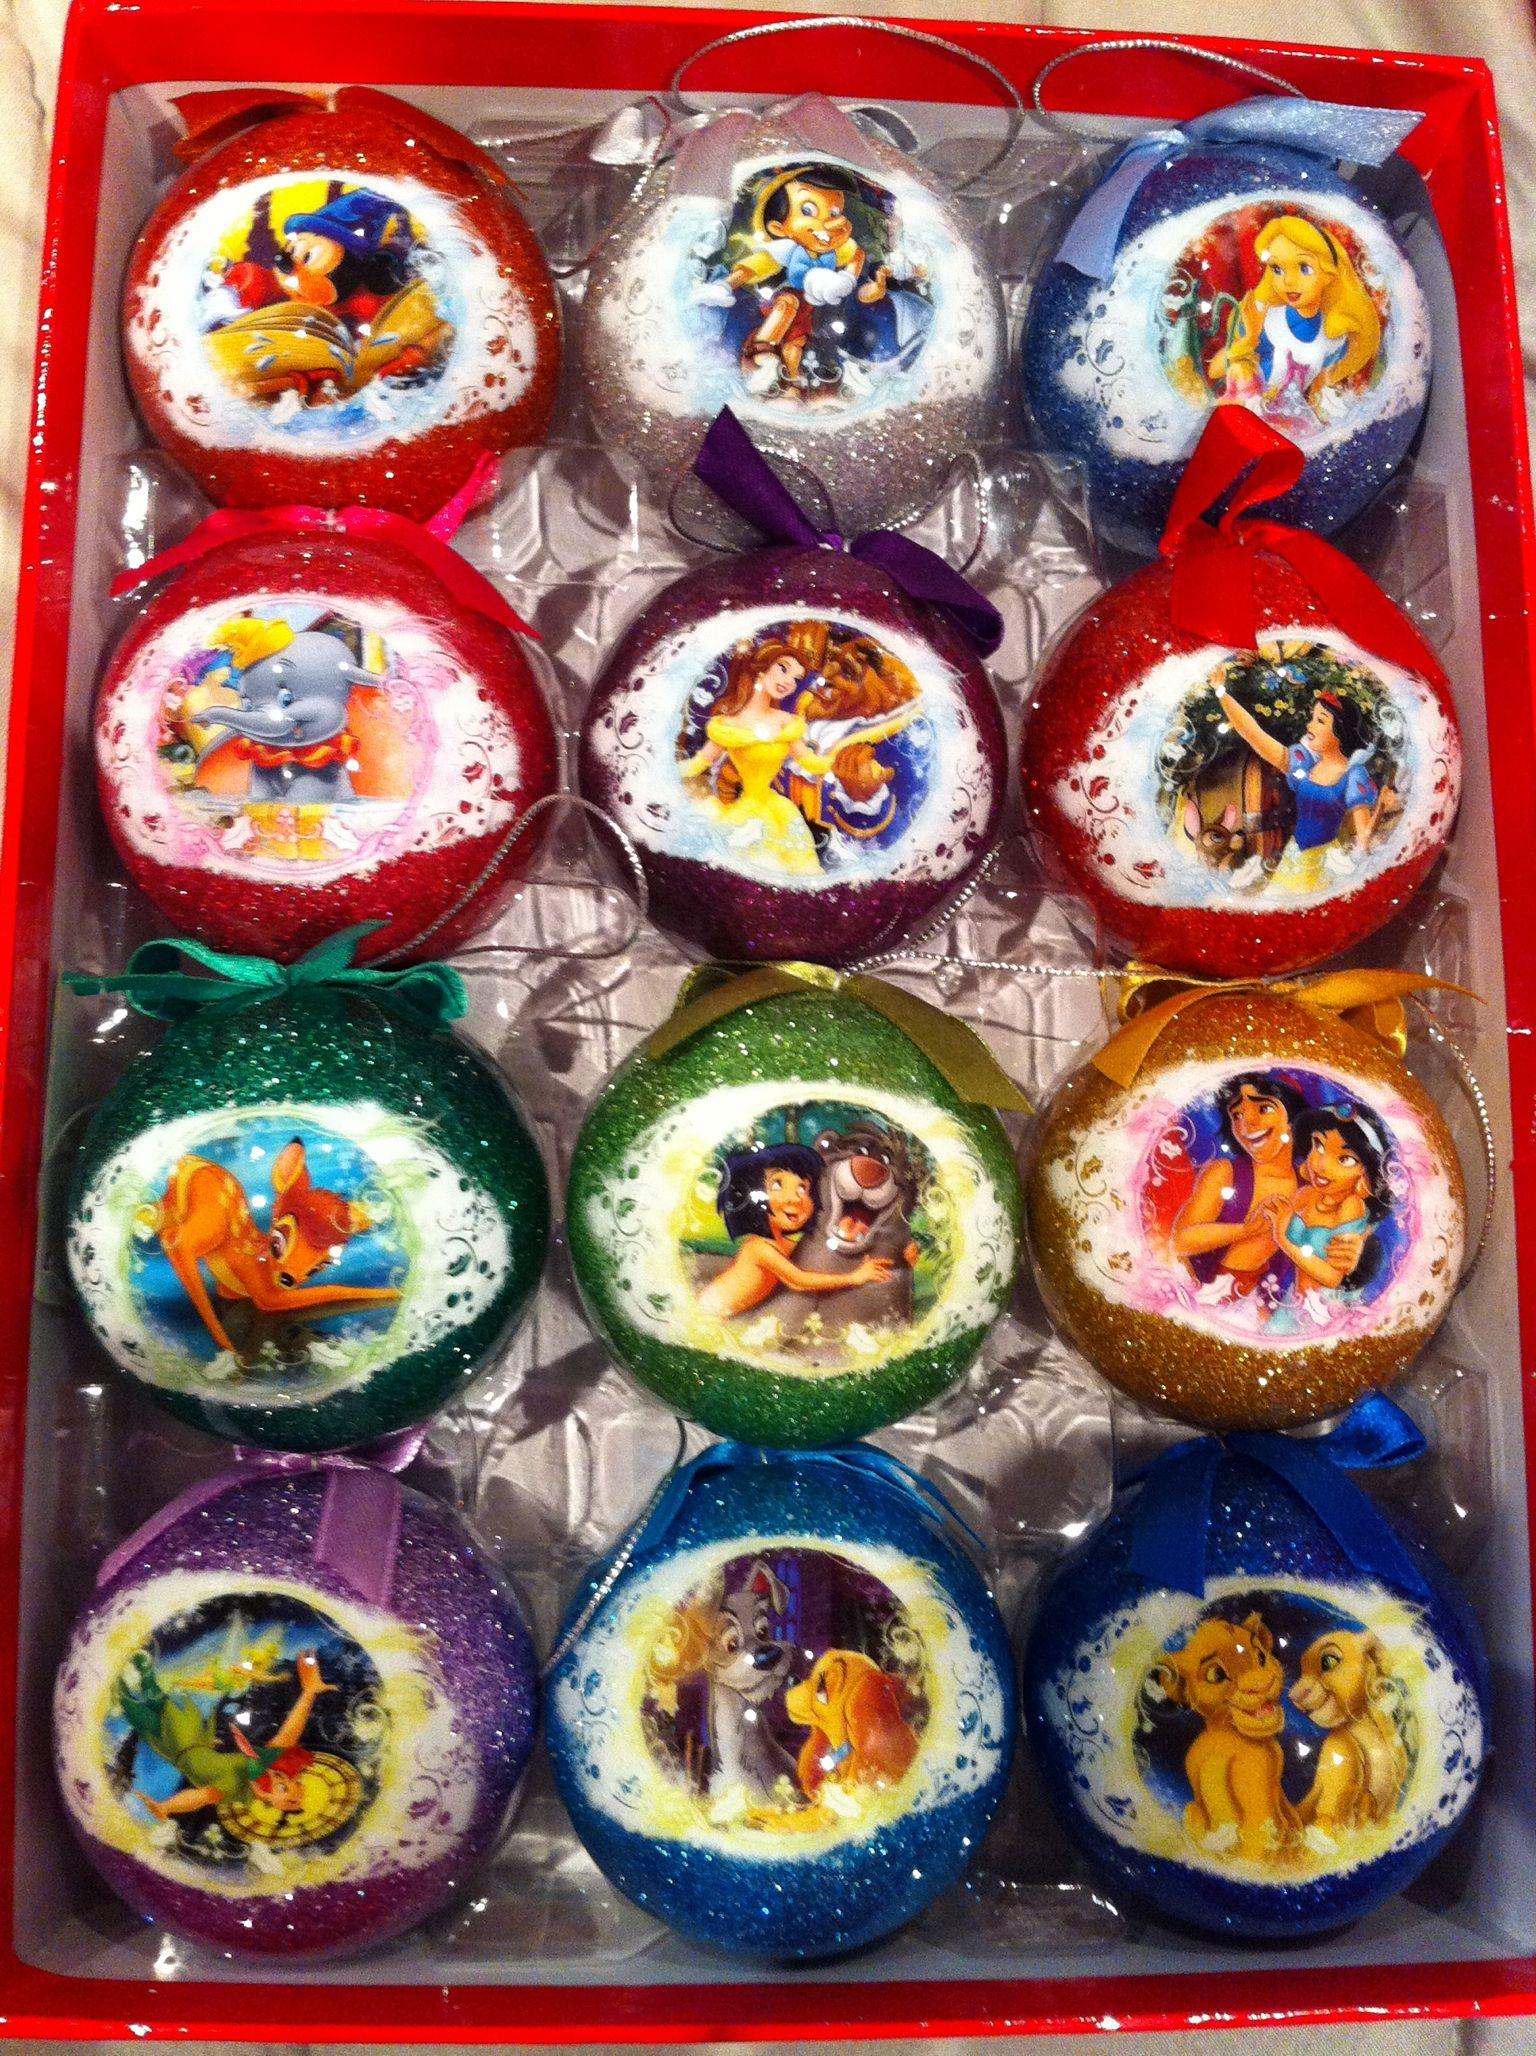 Disney tree ornaments - I Have These On My Disney Christmas Tree